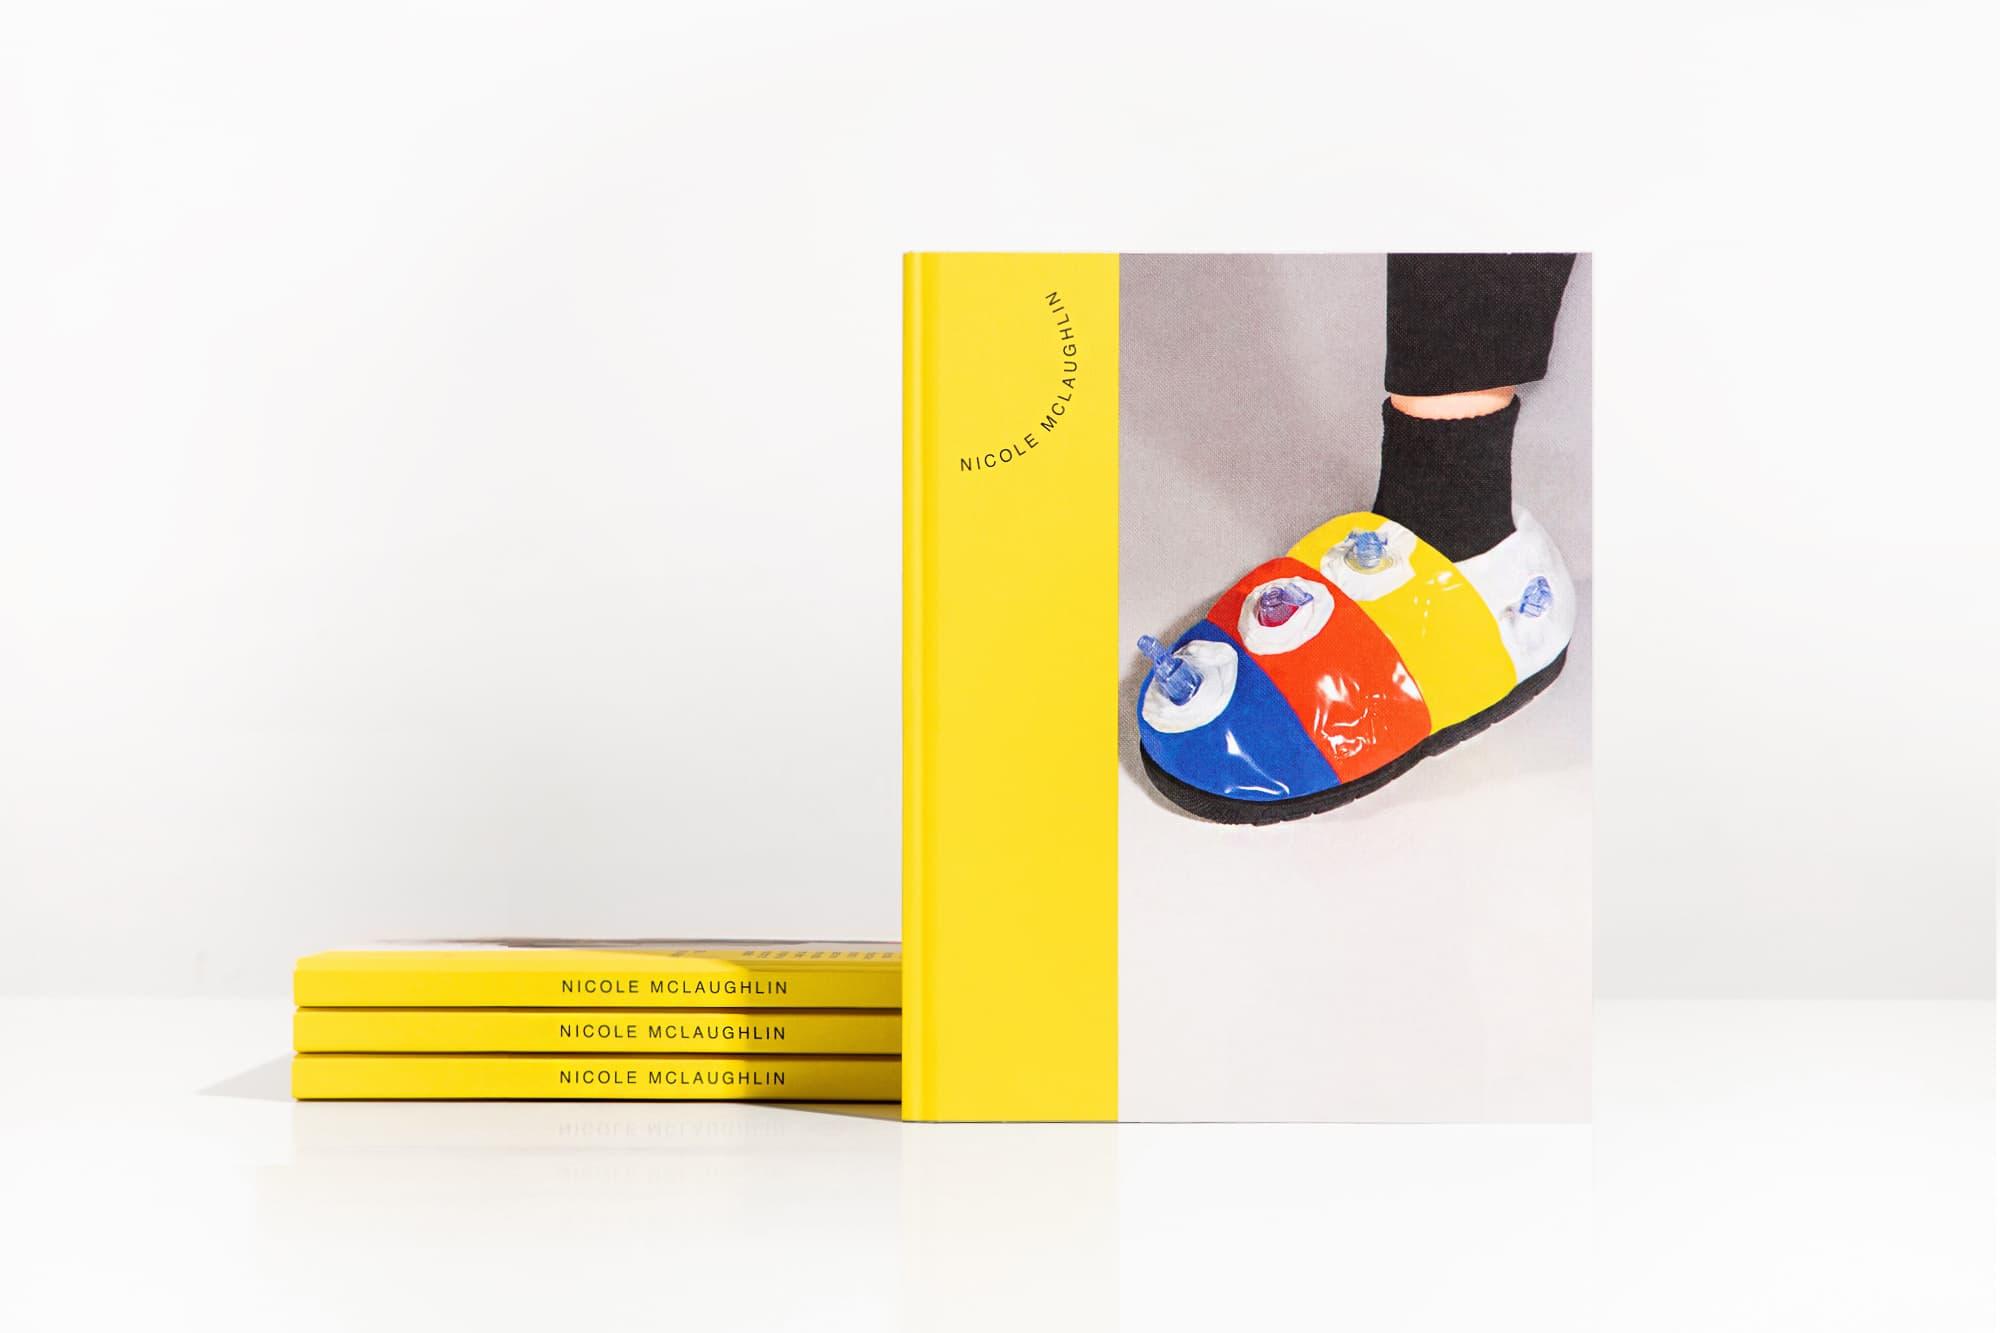 Sarah Andelman Launches 'Just An Idea Books' Series